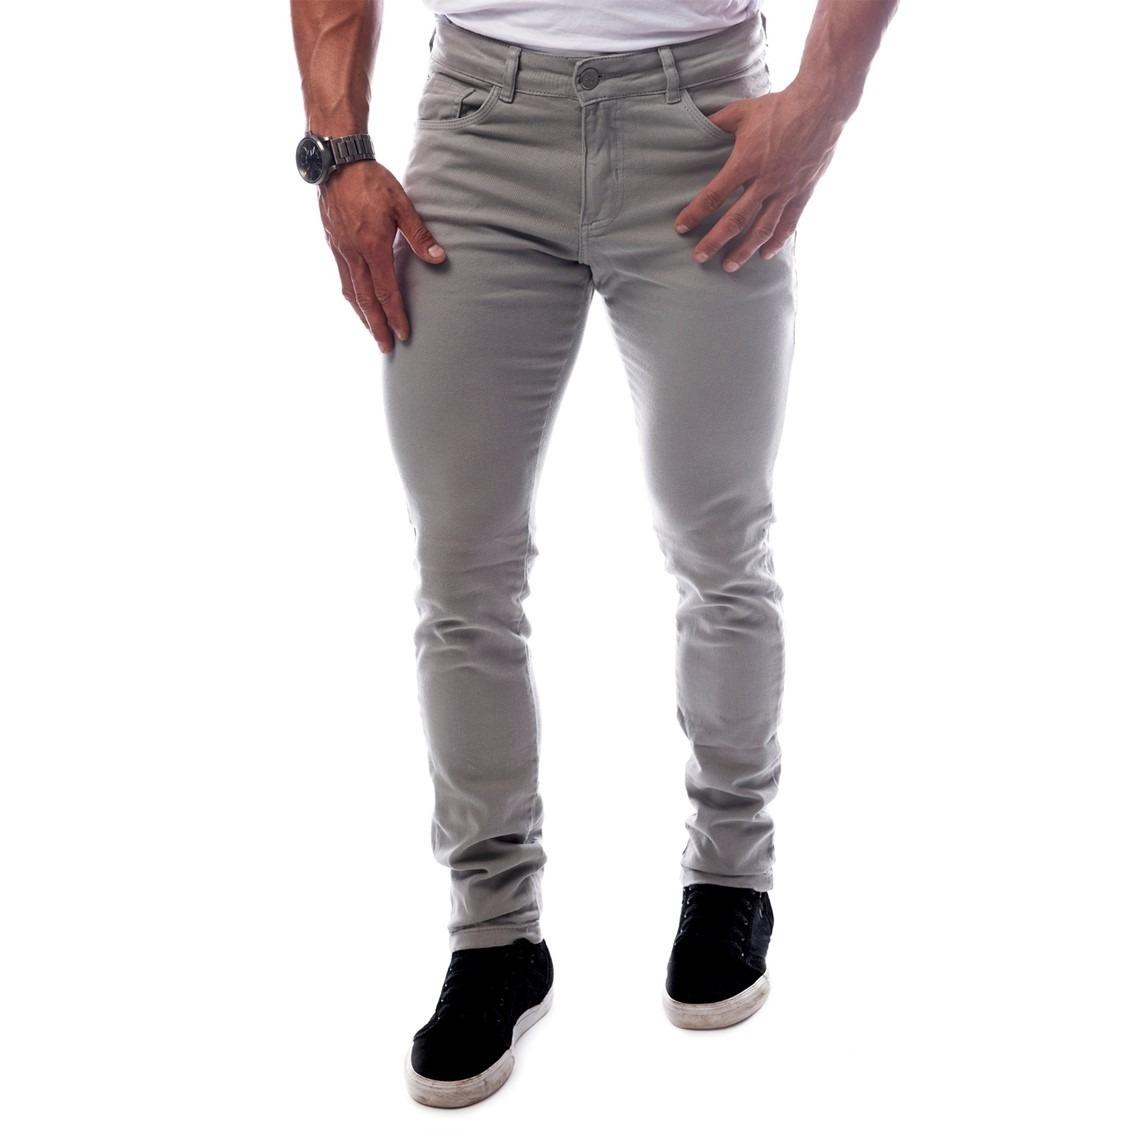 5ac1c6c5c kit 2 calça jeans masculina skinny premium com elastano. Carregando zoom.